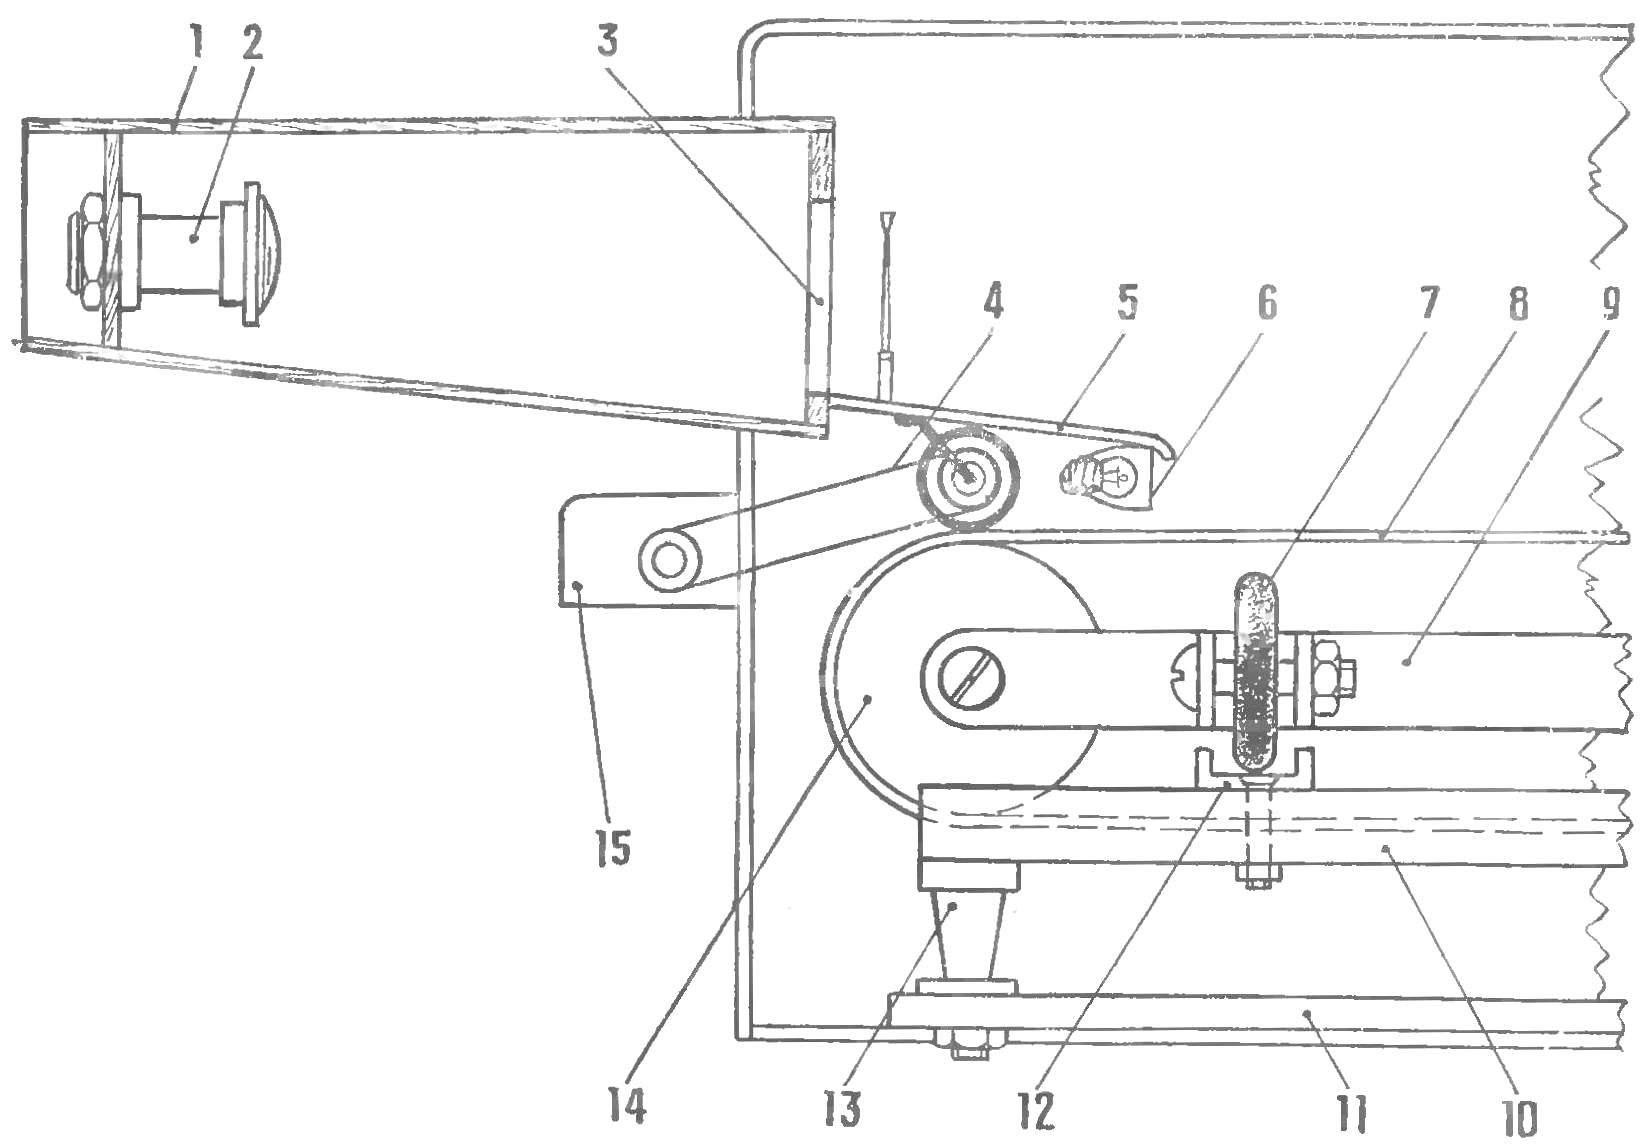 Fig. 2. Design of driving simulator